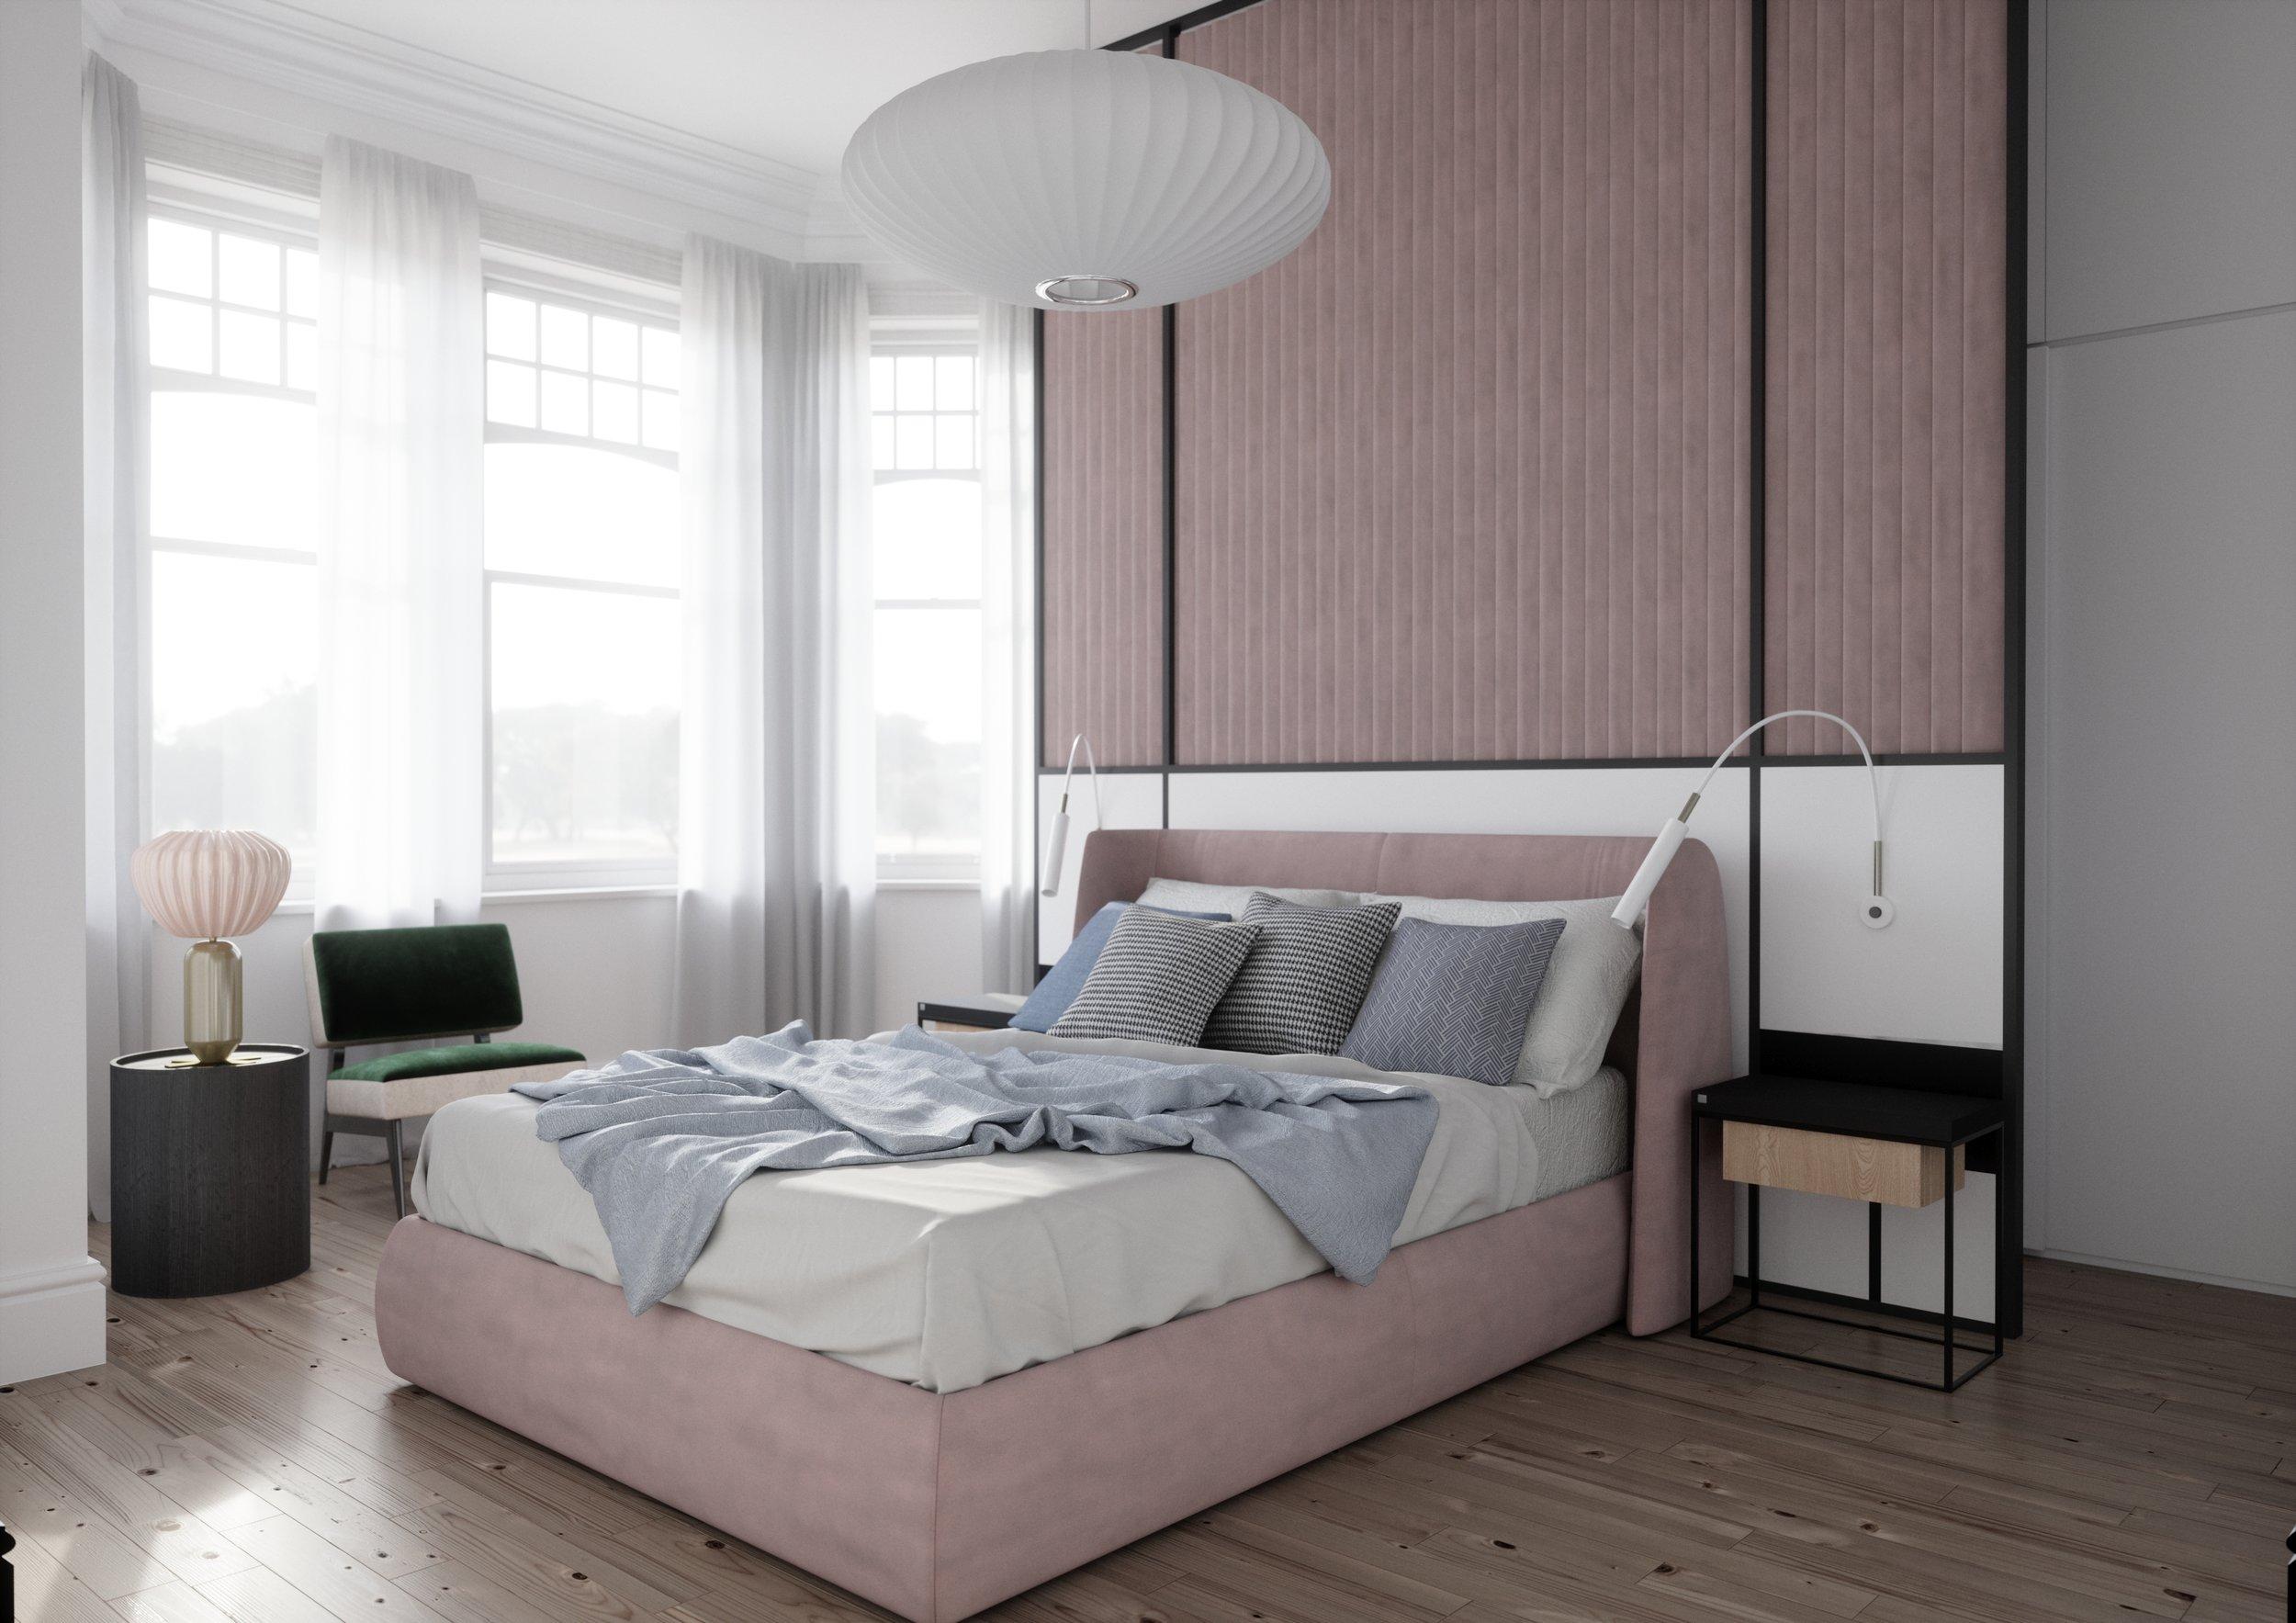 West Hampstead Interior Design Master Bedroom 1.jpg